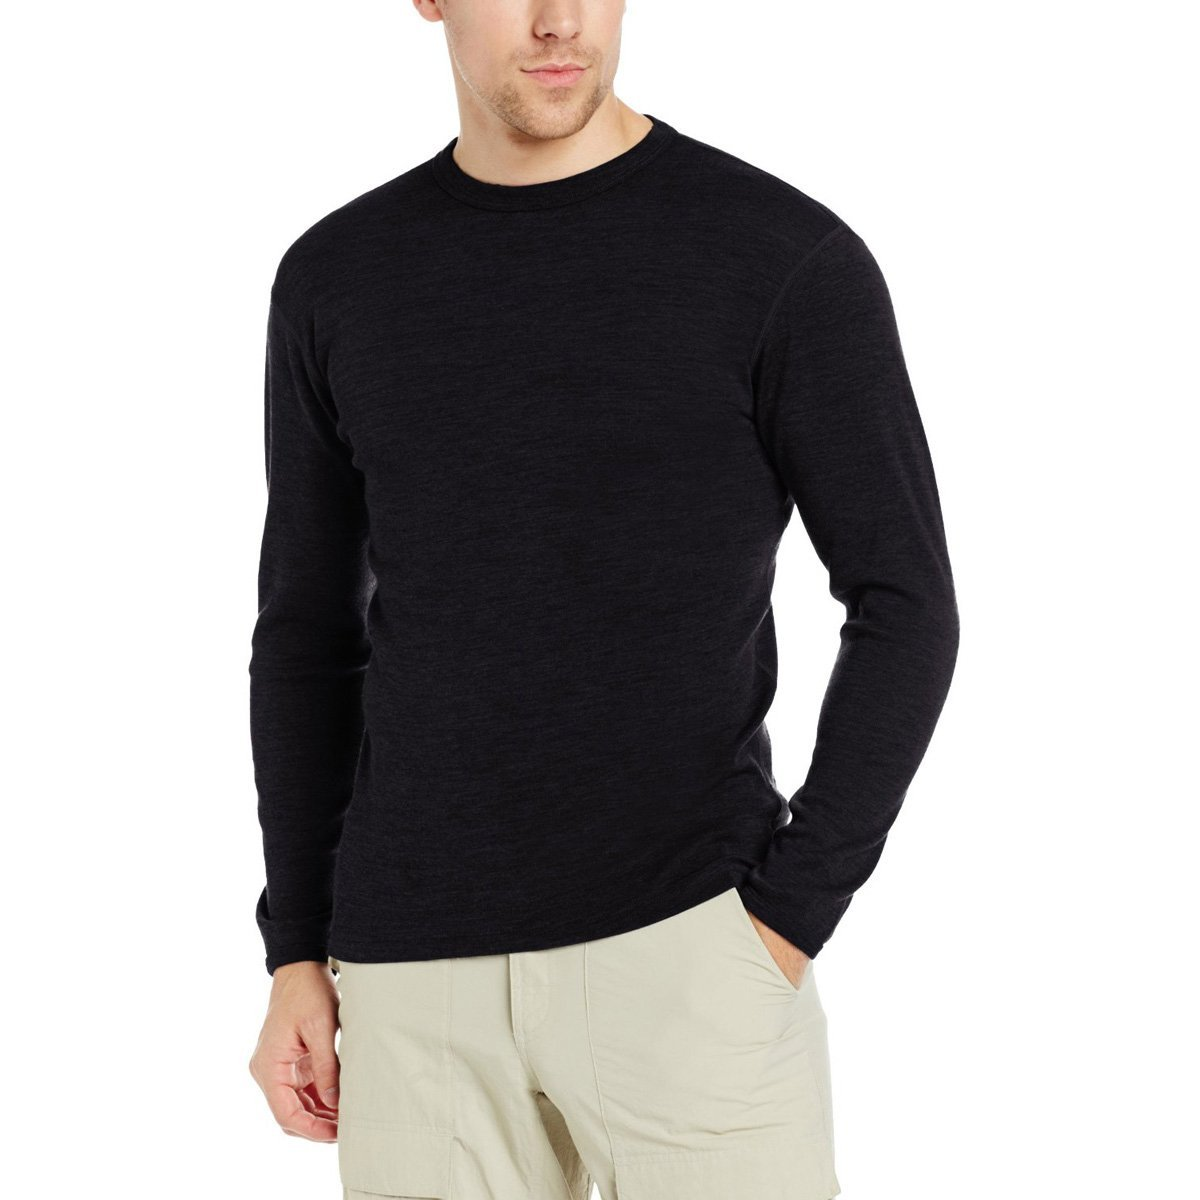 Minus33 100% Merino Wool Base Layer 705 MidWeight Crew Neck Top Black Medium [並行輸入品] B07R4WH21M